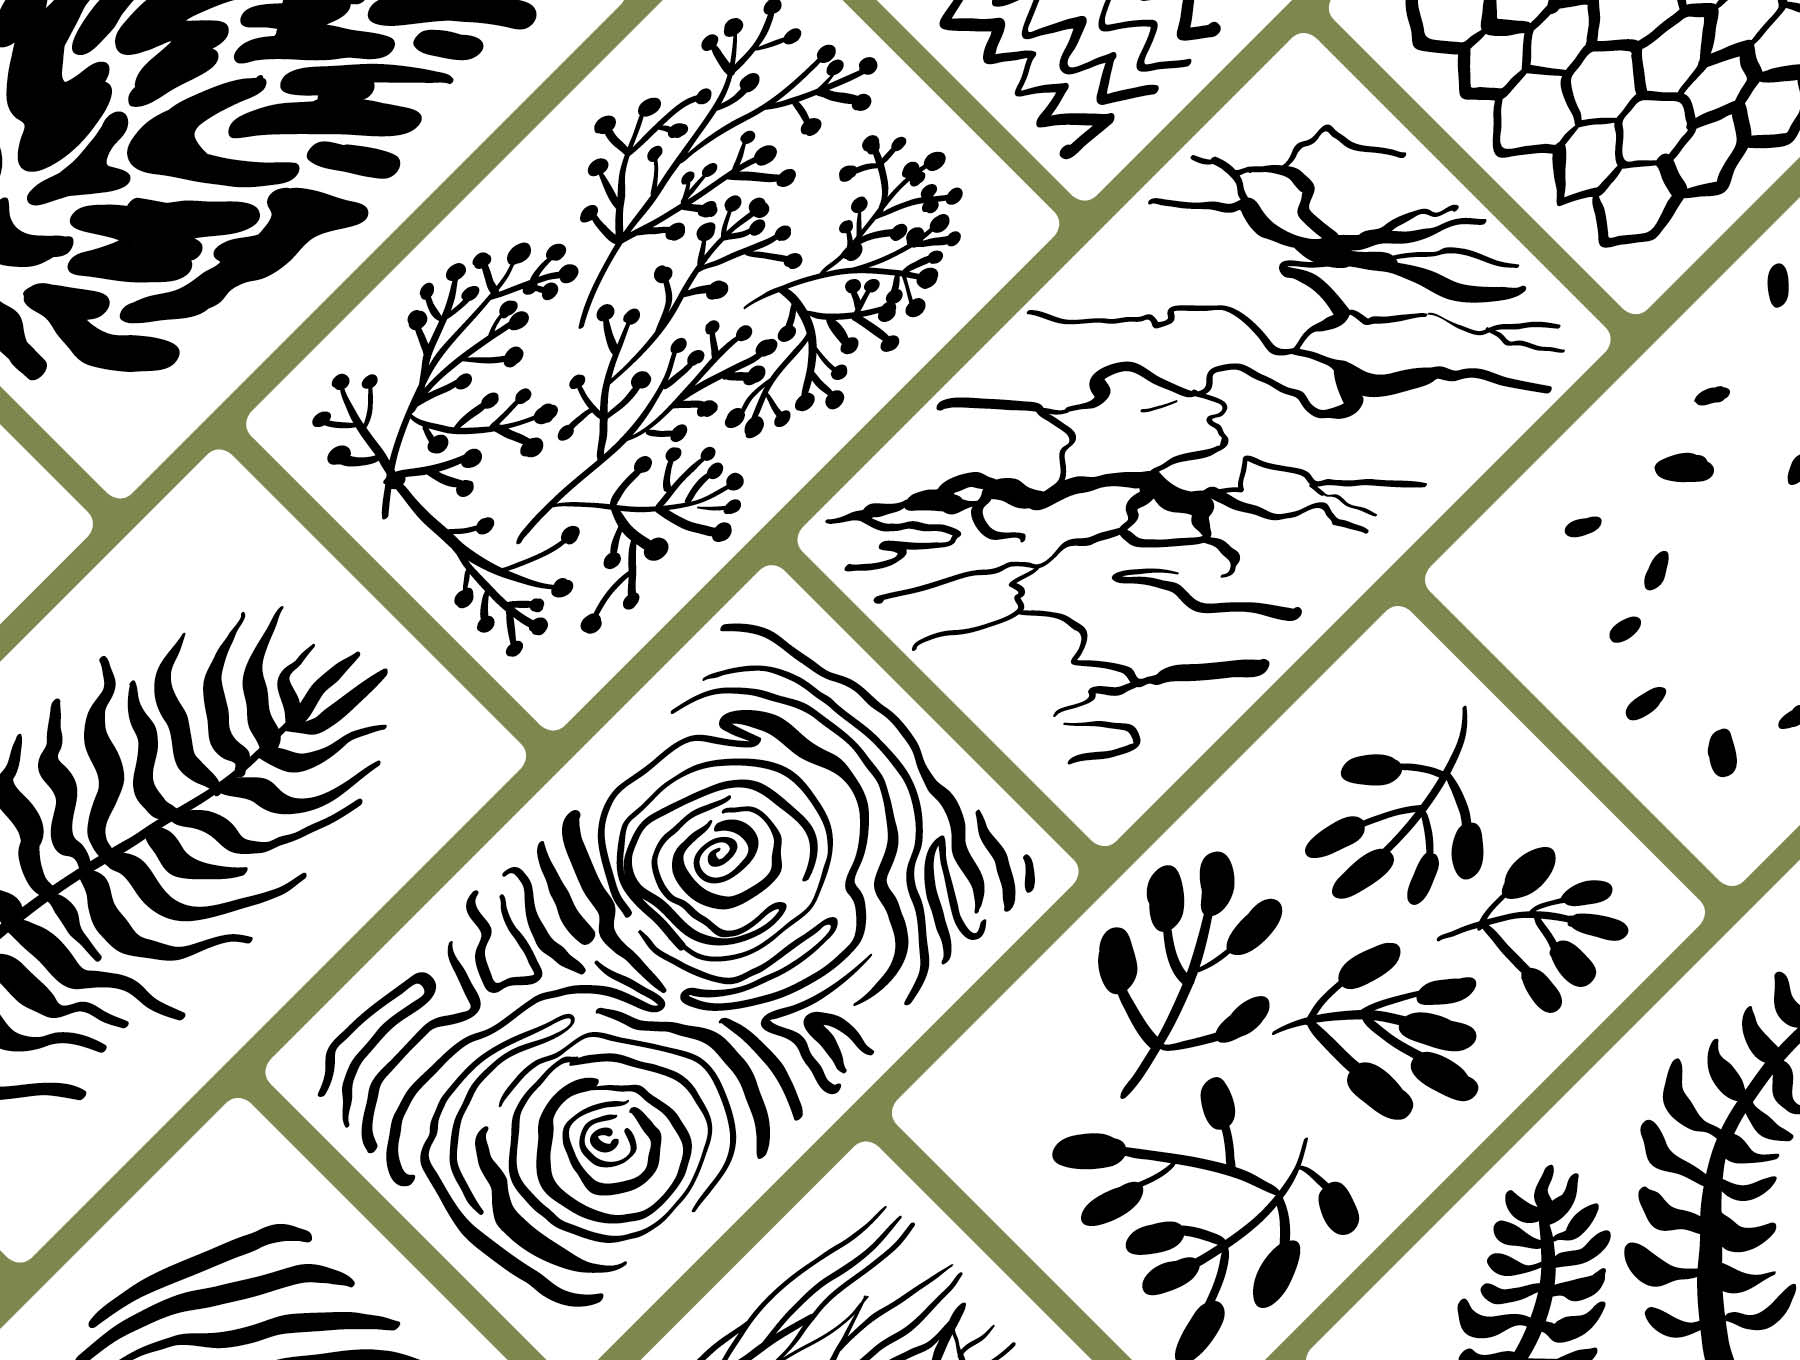 patterny26_1585932343480